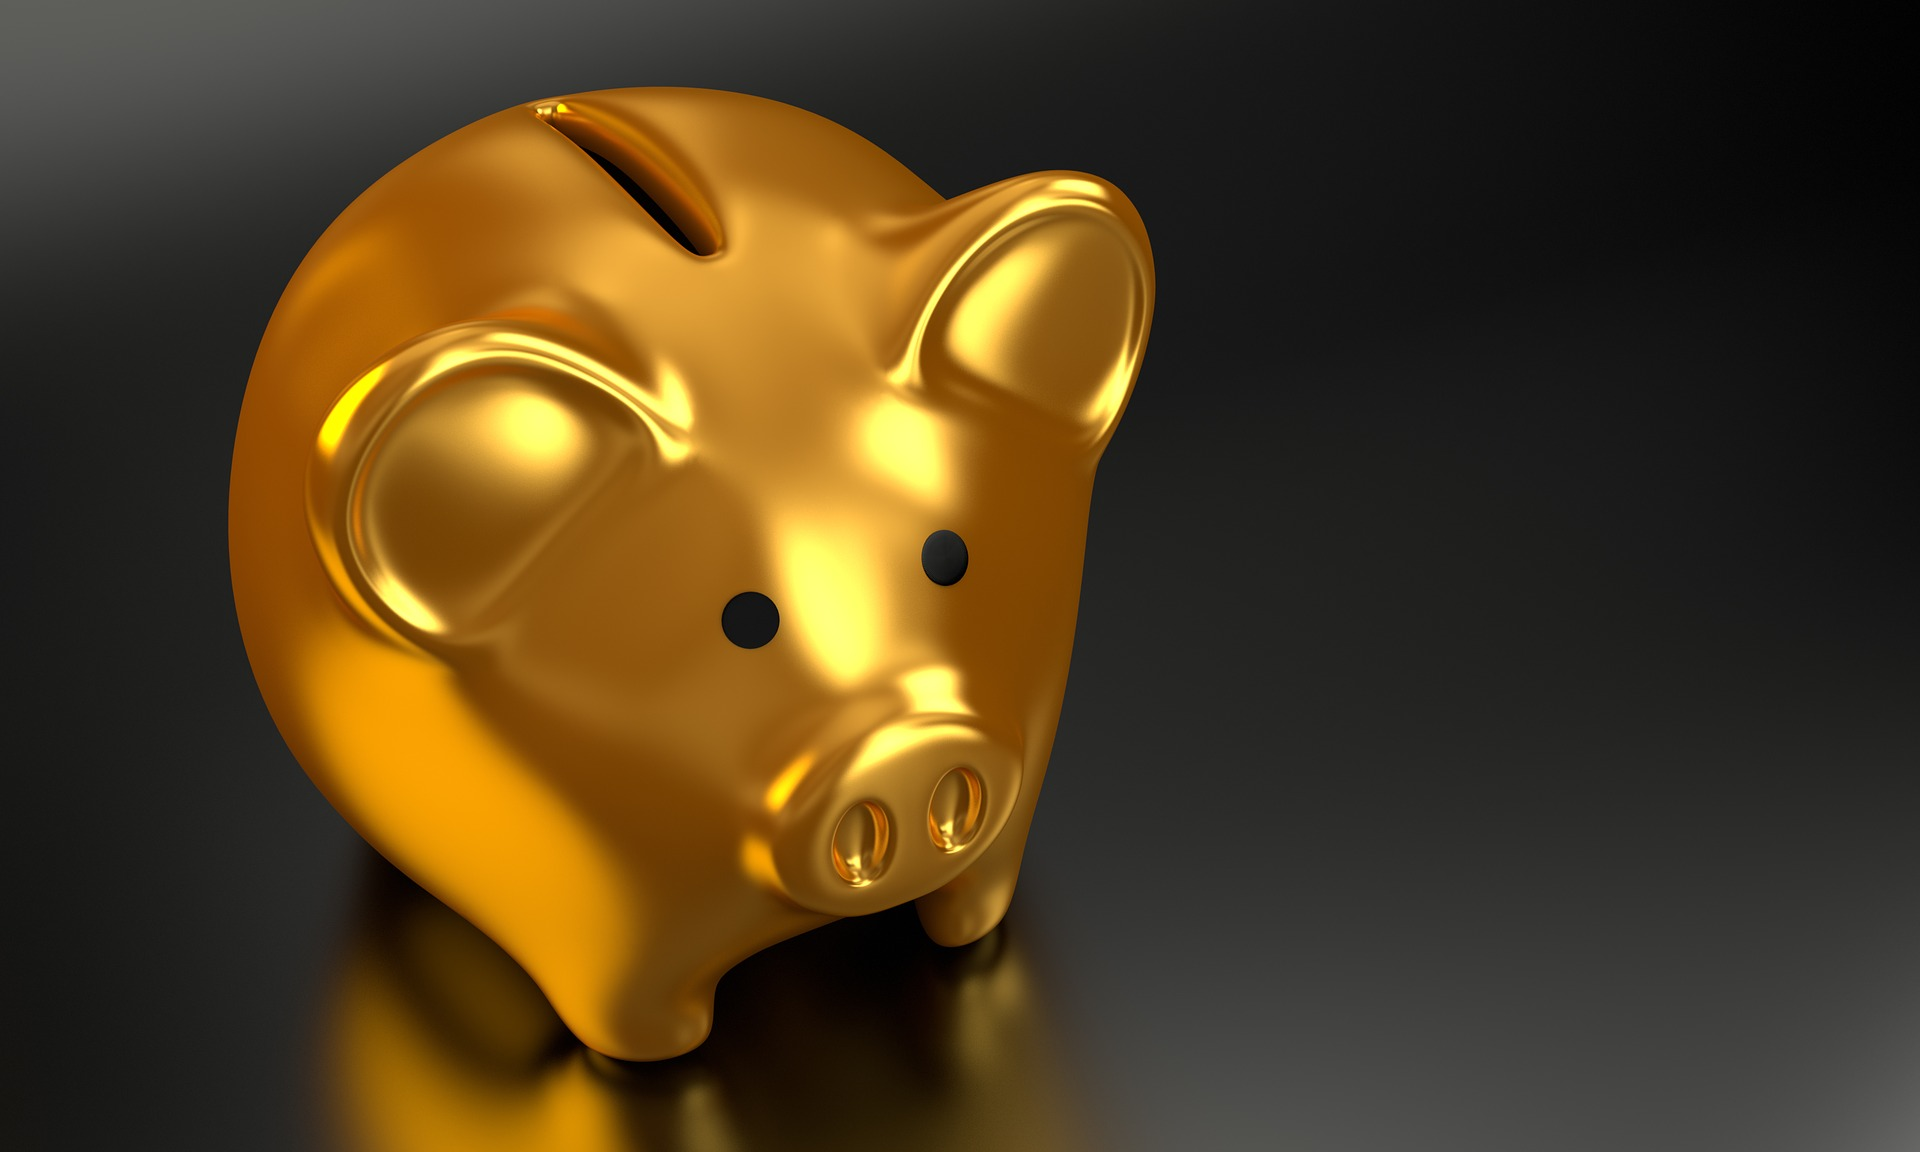 cum sa faci bani zodie - sfatulparintilor.ro - pixabay_com - piggy-bank-2889046_1920